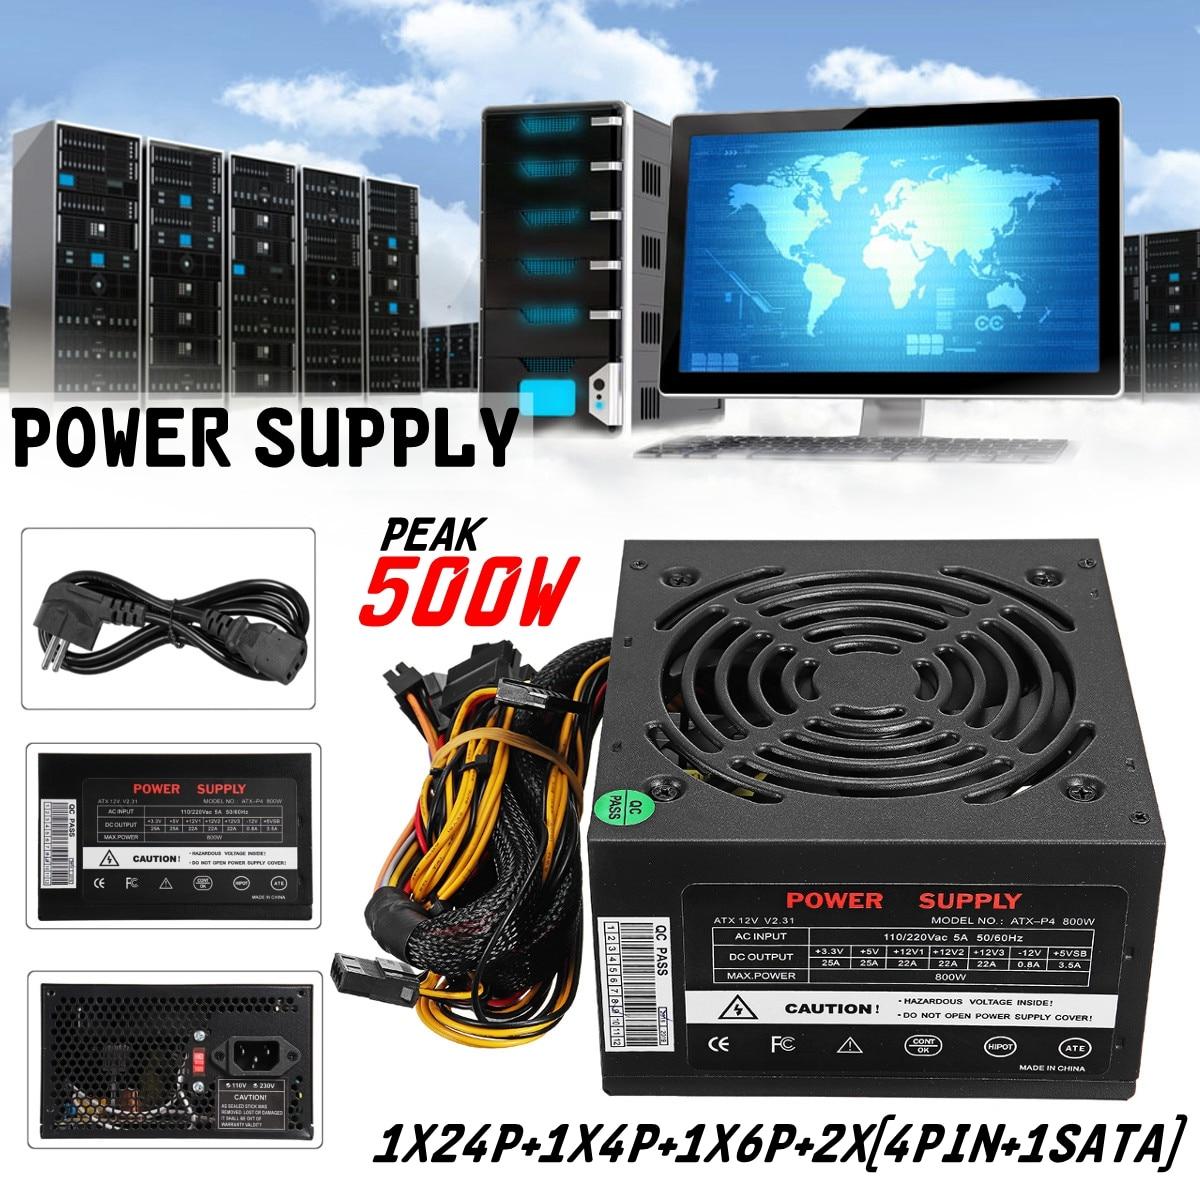 Black Max 500W PSU /PFC/ATX 24Pin SATA Gaming PC Power Supply For Intel AMD Computer Power Supply 400w desktop power supply max 500w psu quiet power switching 12v atx btc sata power supply computer chassis for intel amd pc